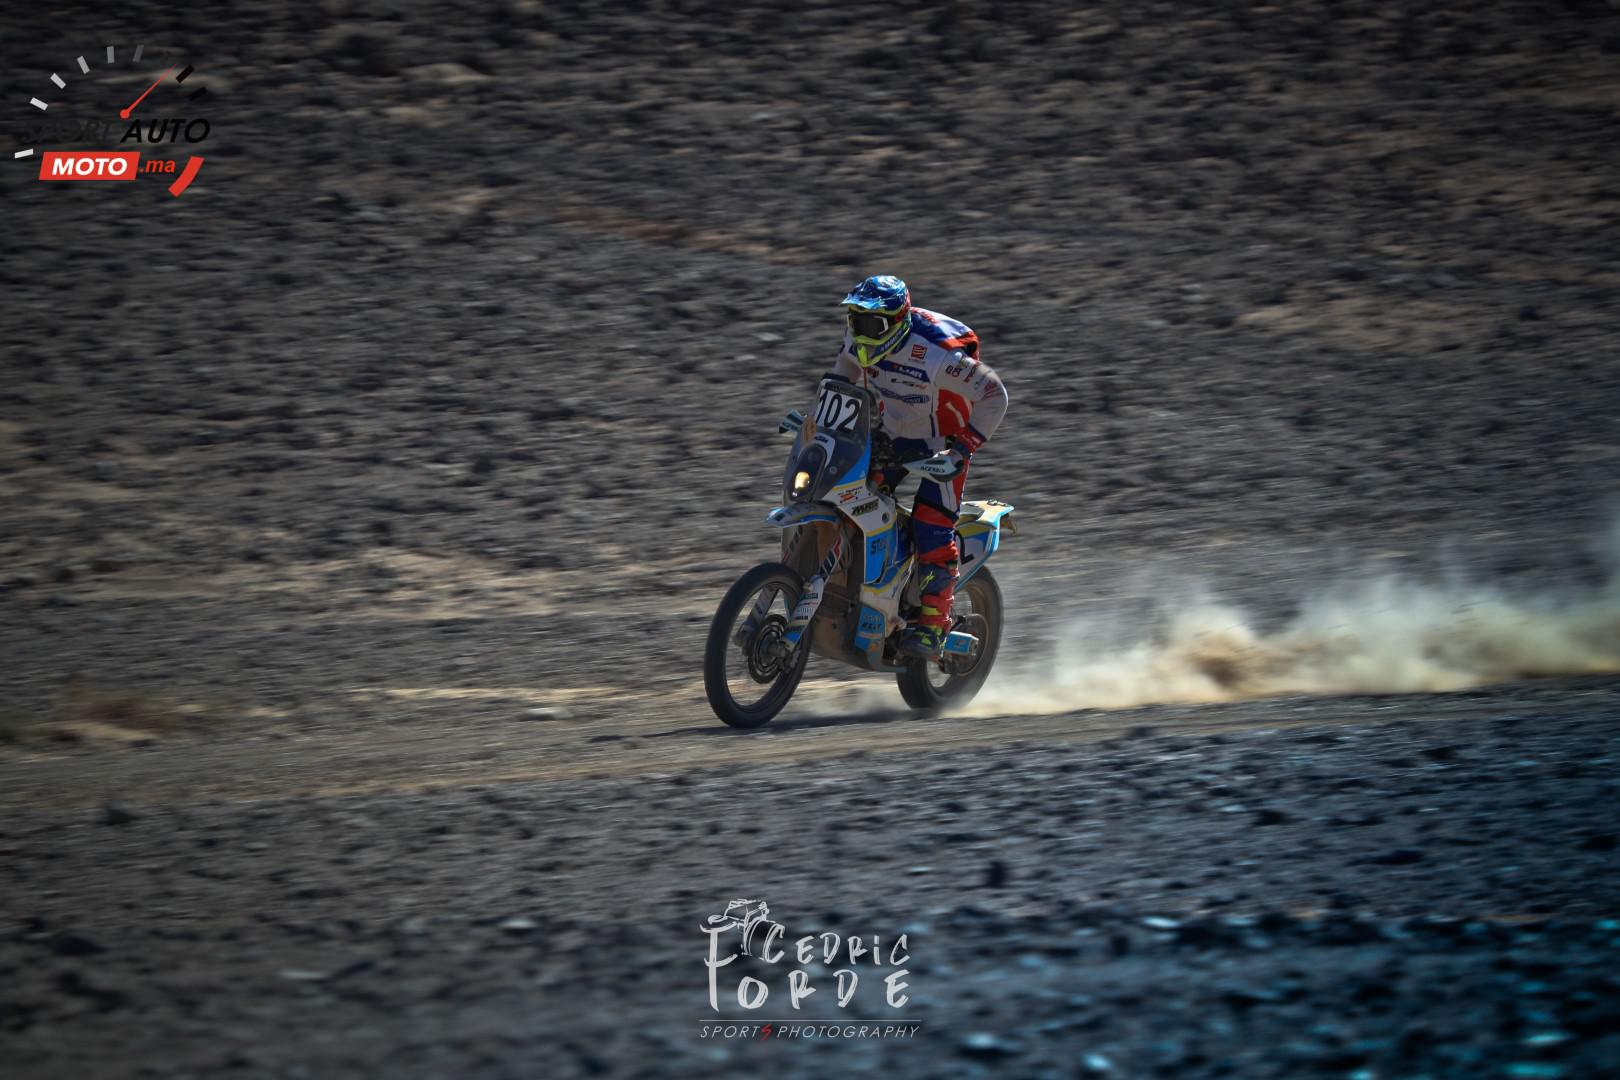 hearts-of-morocco-2018-zapletal-et-svitko-vainqueur-du-jour-895-1.jpg